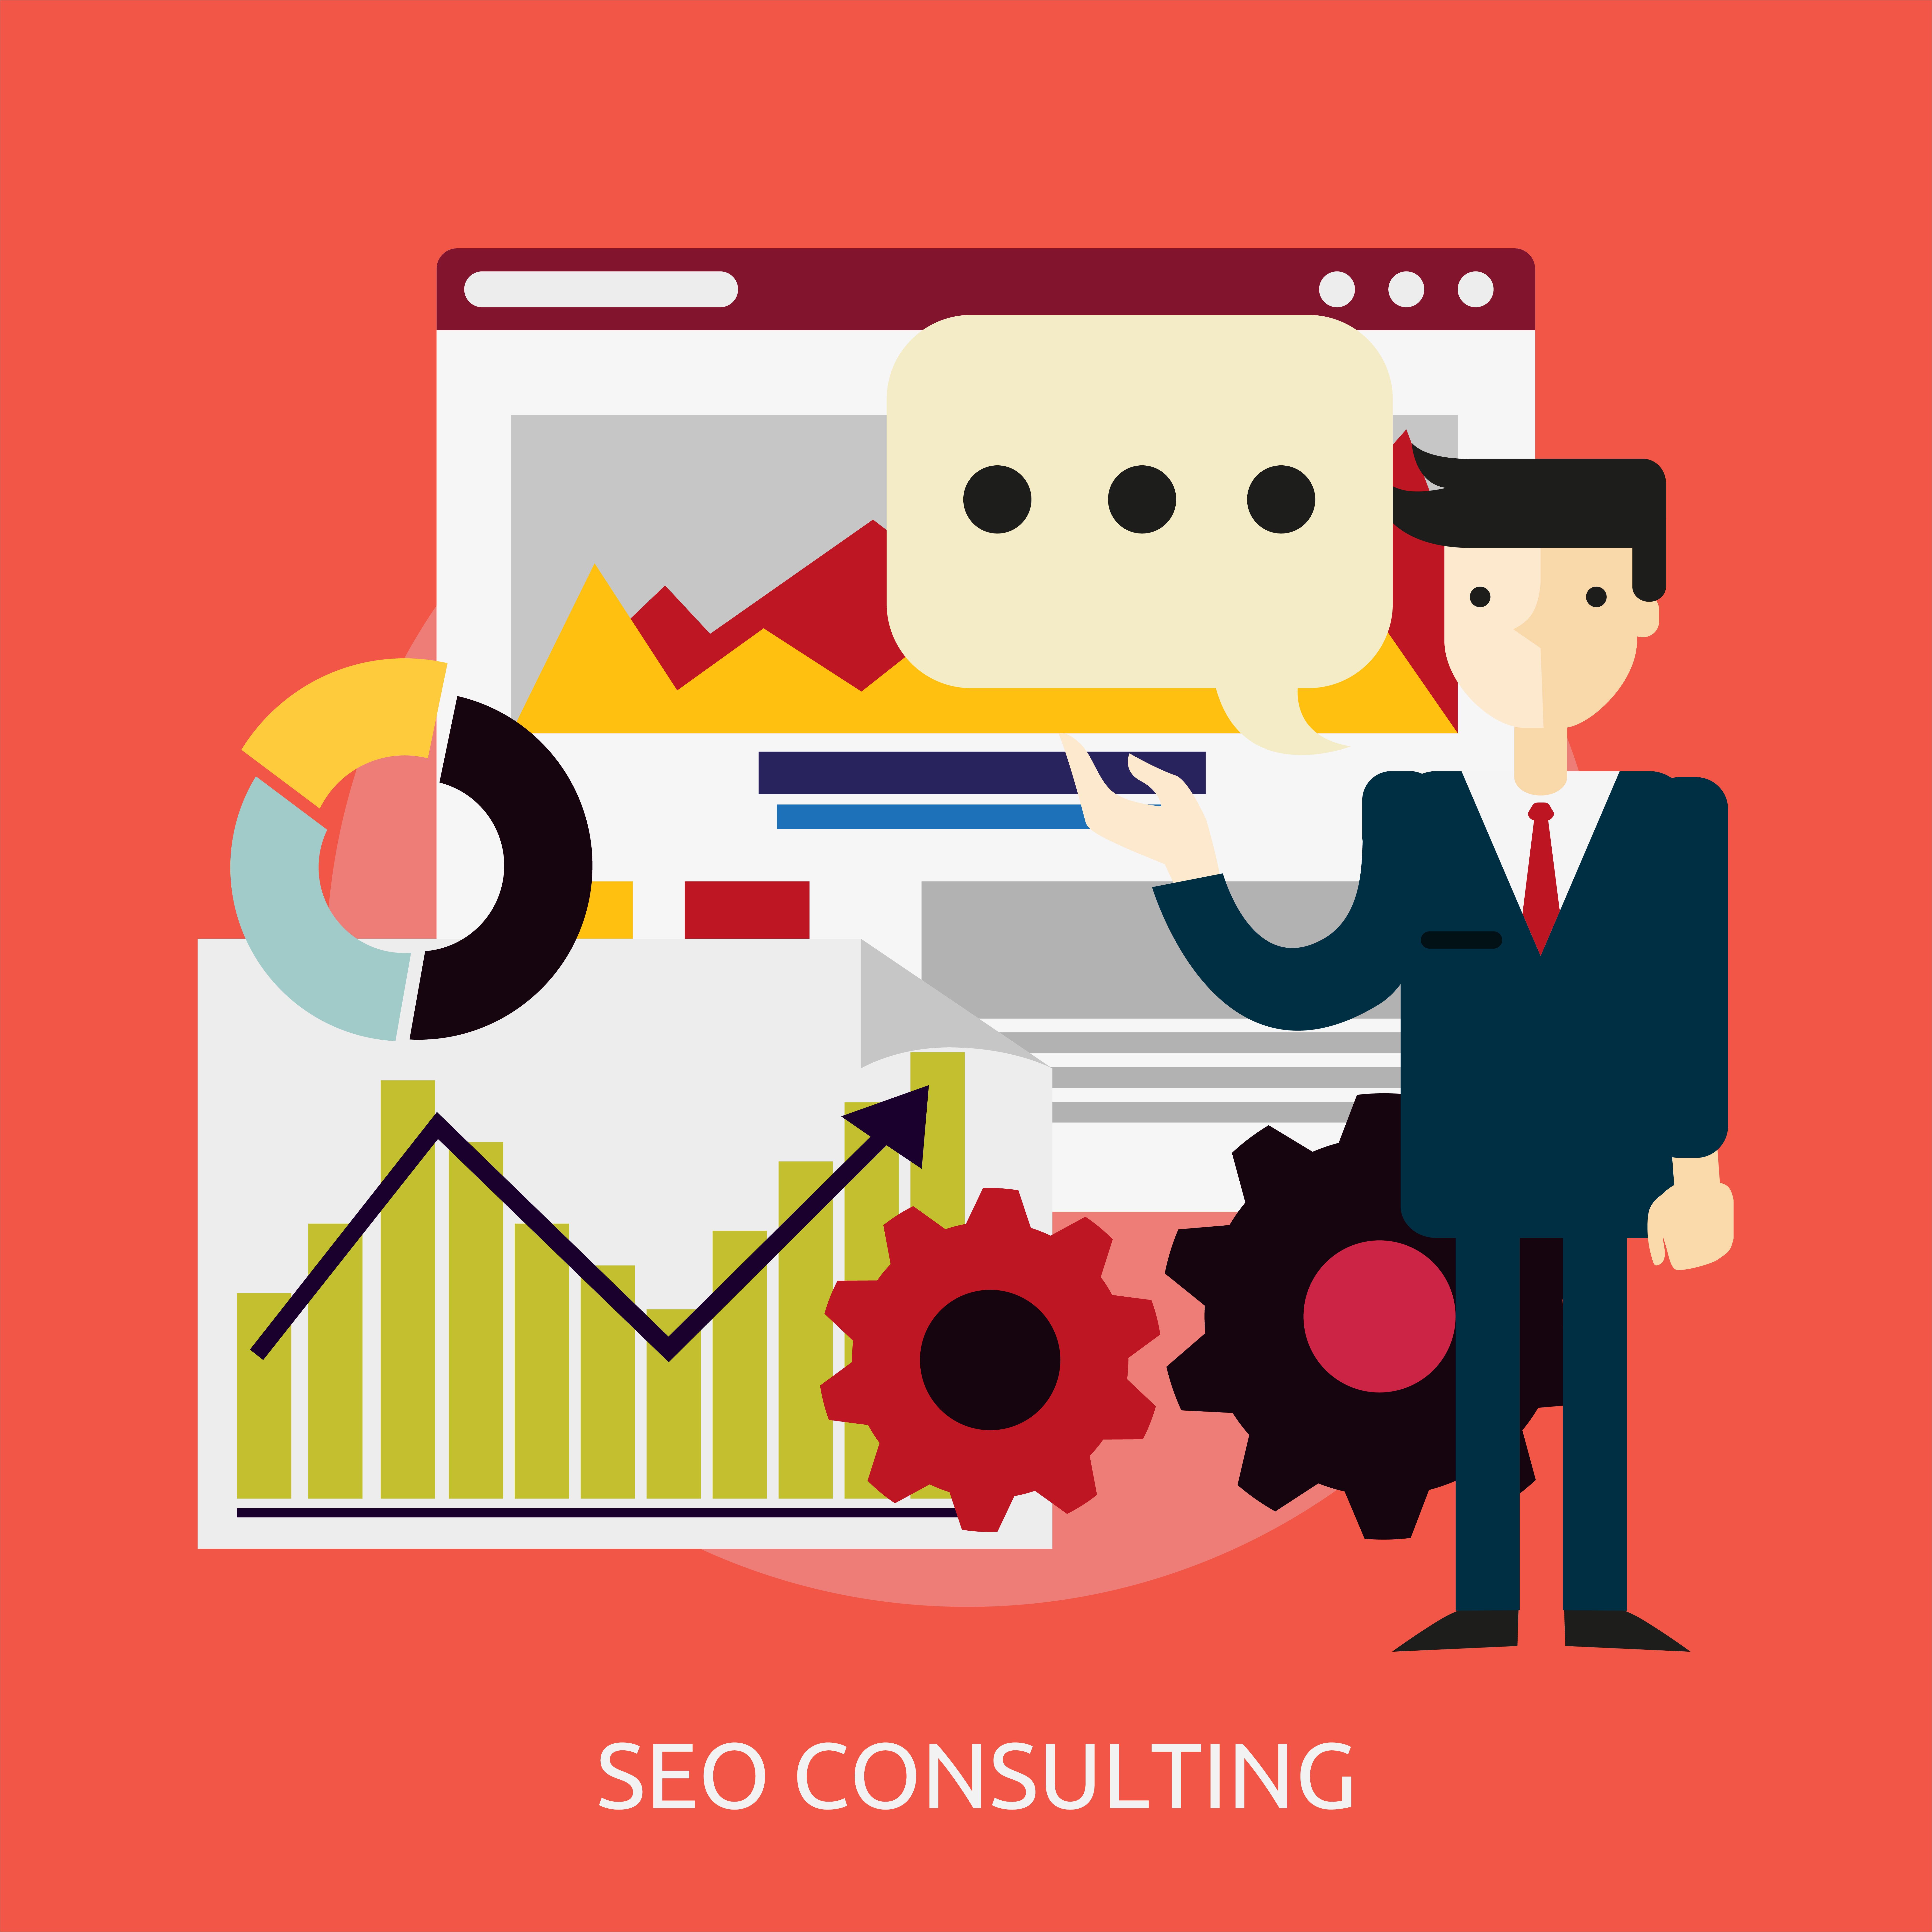 vector-seo-consulting-conceptual-illustration-design.jpg